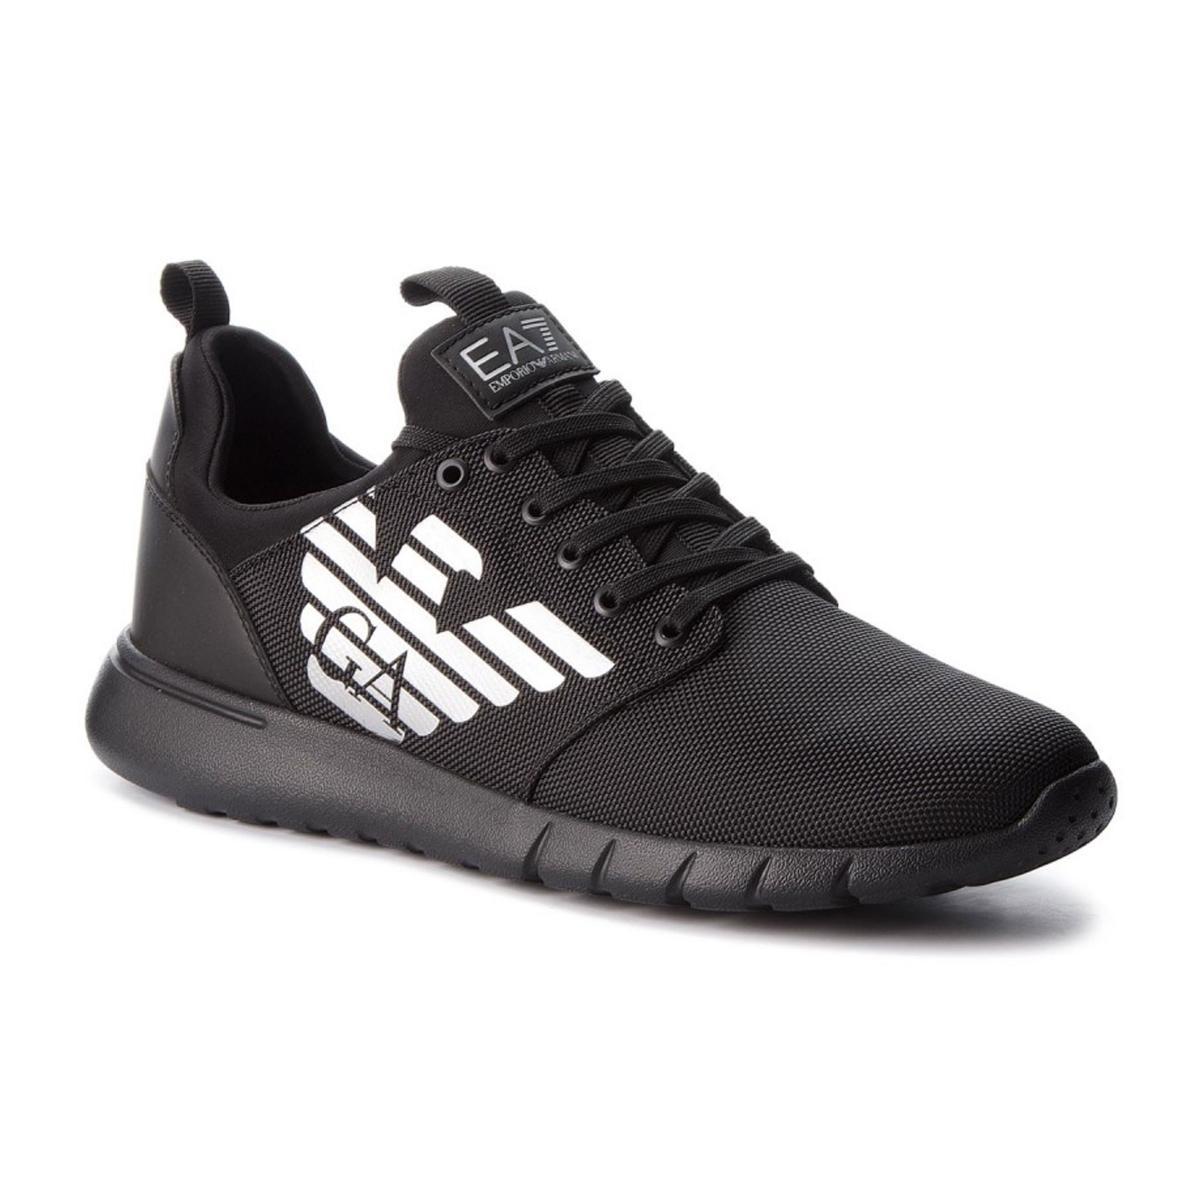 Scarpe Sneaker EA7 Emporio Armani Ecopelle Black X8X008 XK008 00002 Uomo